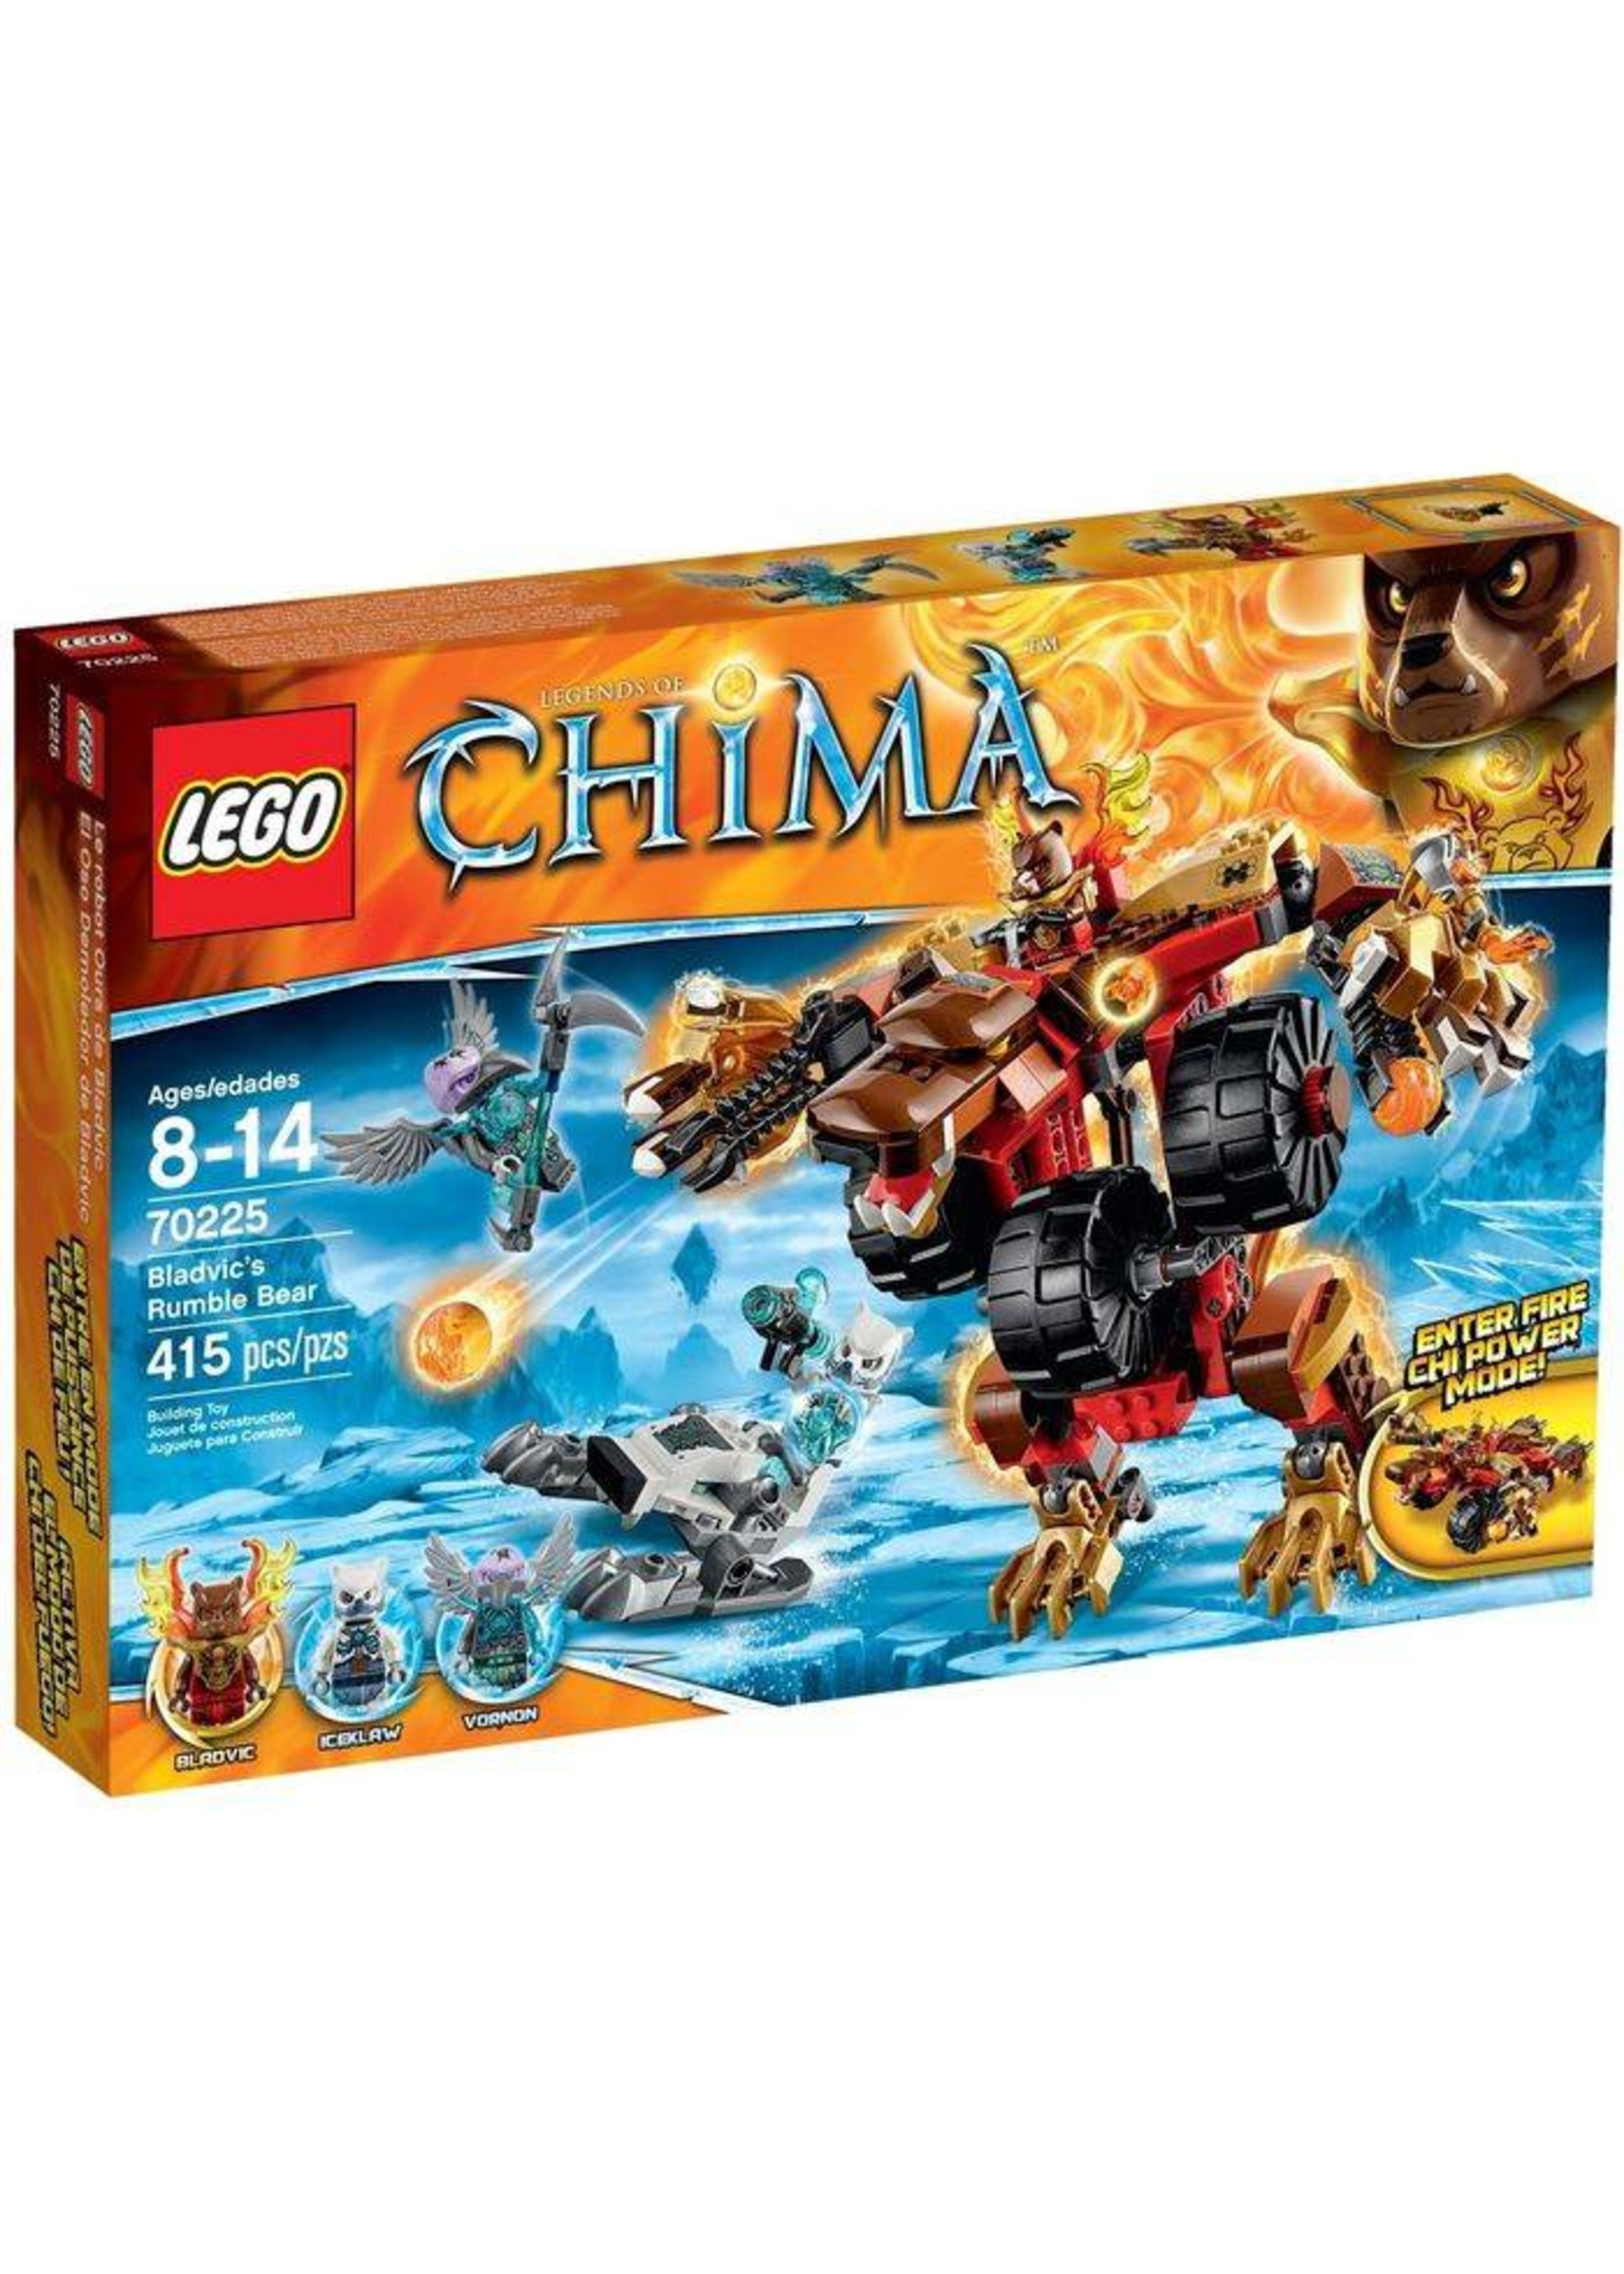 Lego Lego 70225 Chima Bladvic's Rumble Bear